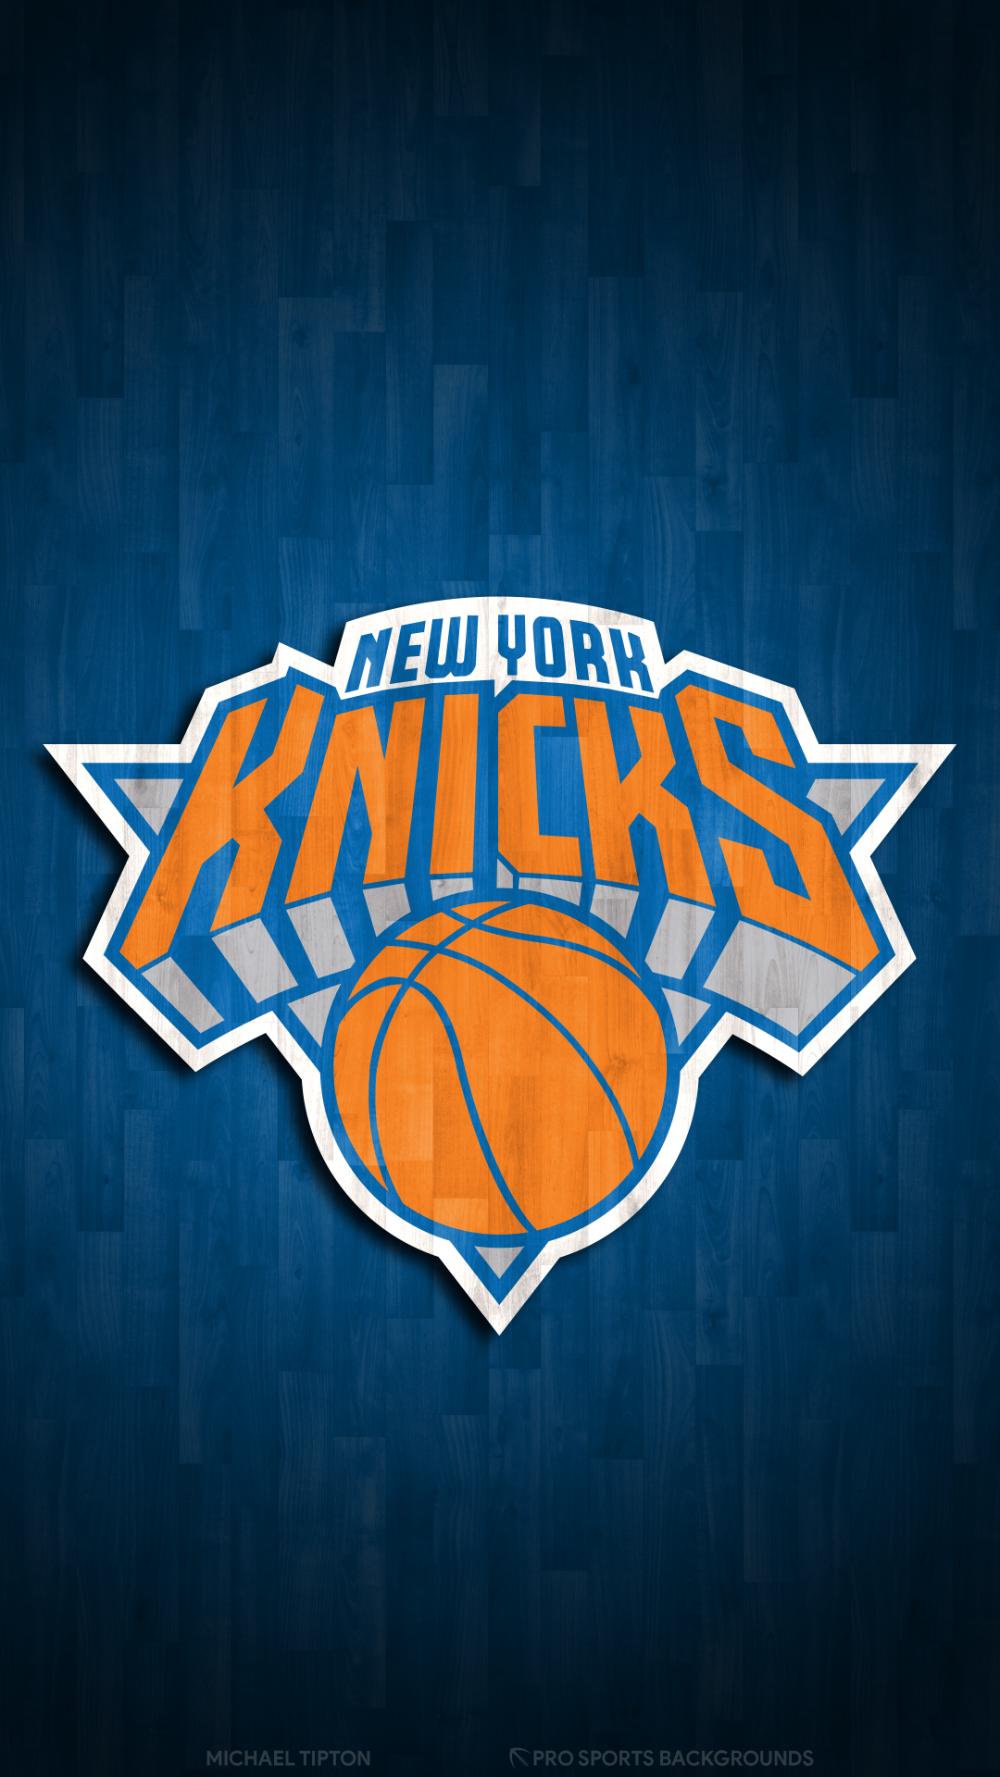 New York Knicks Wallpapers New York Knicks Logo New York Knicks